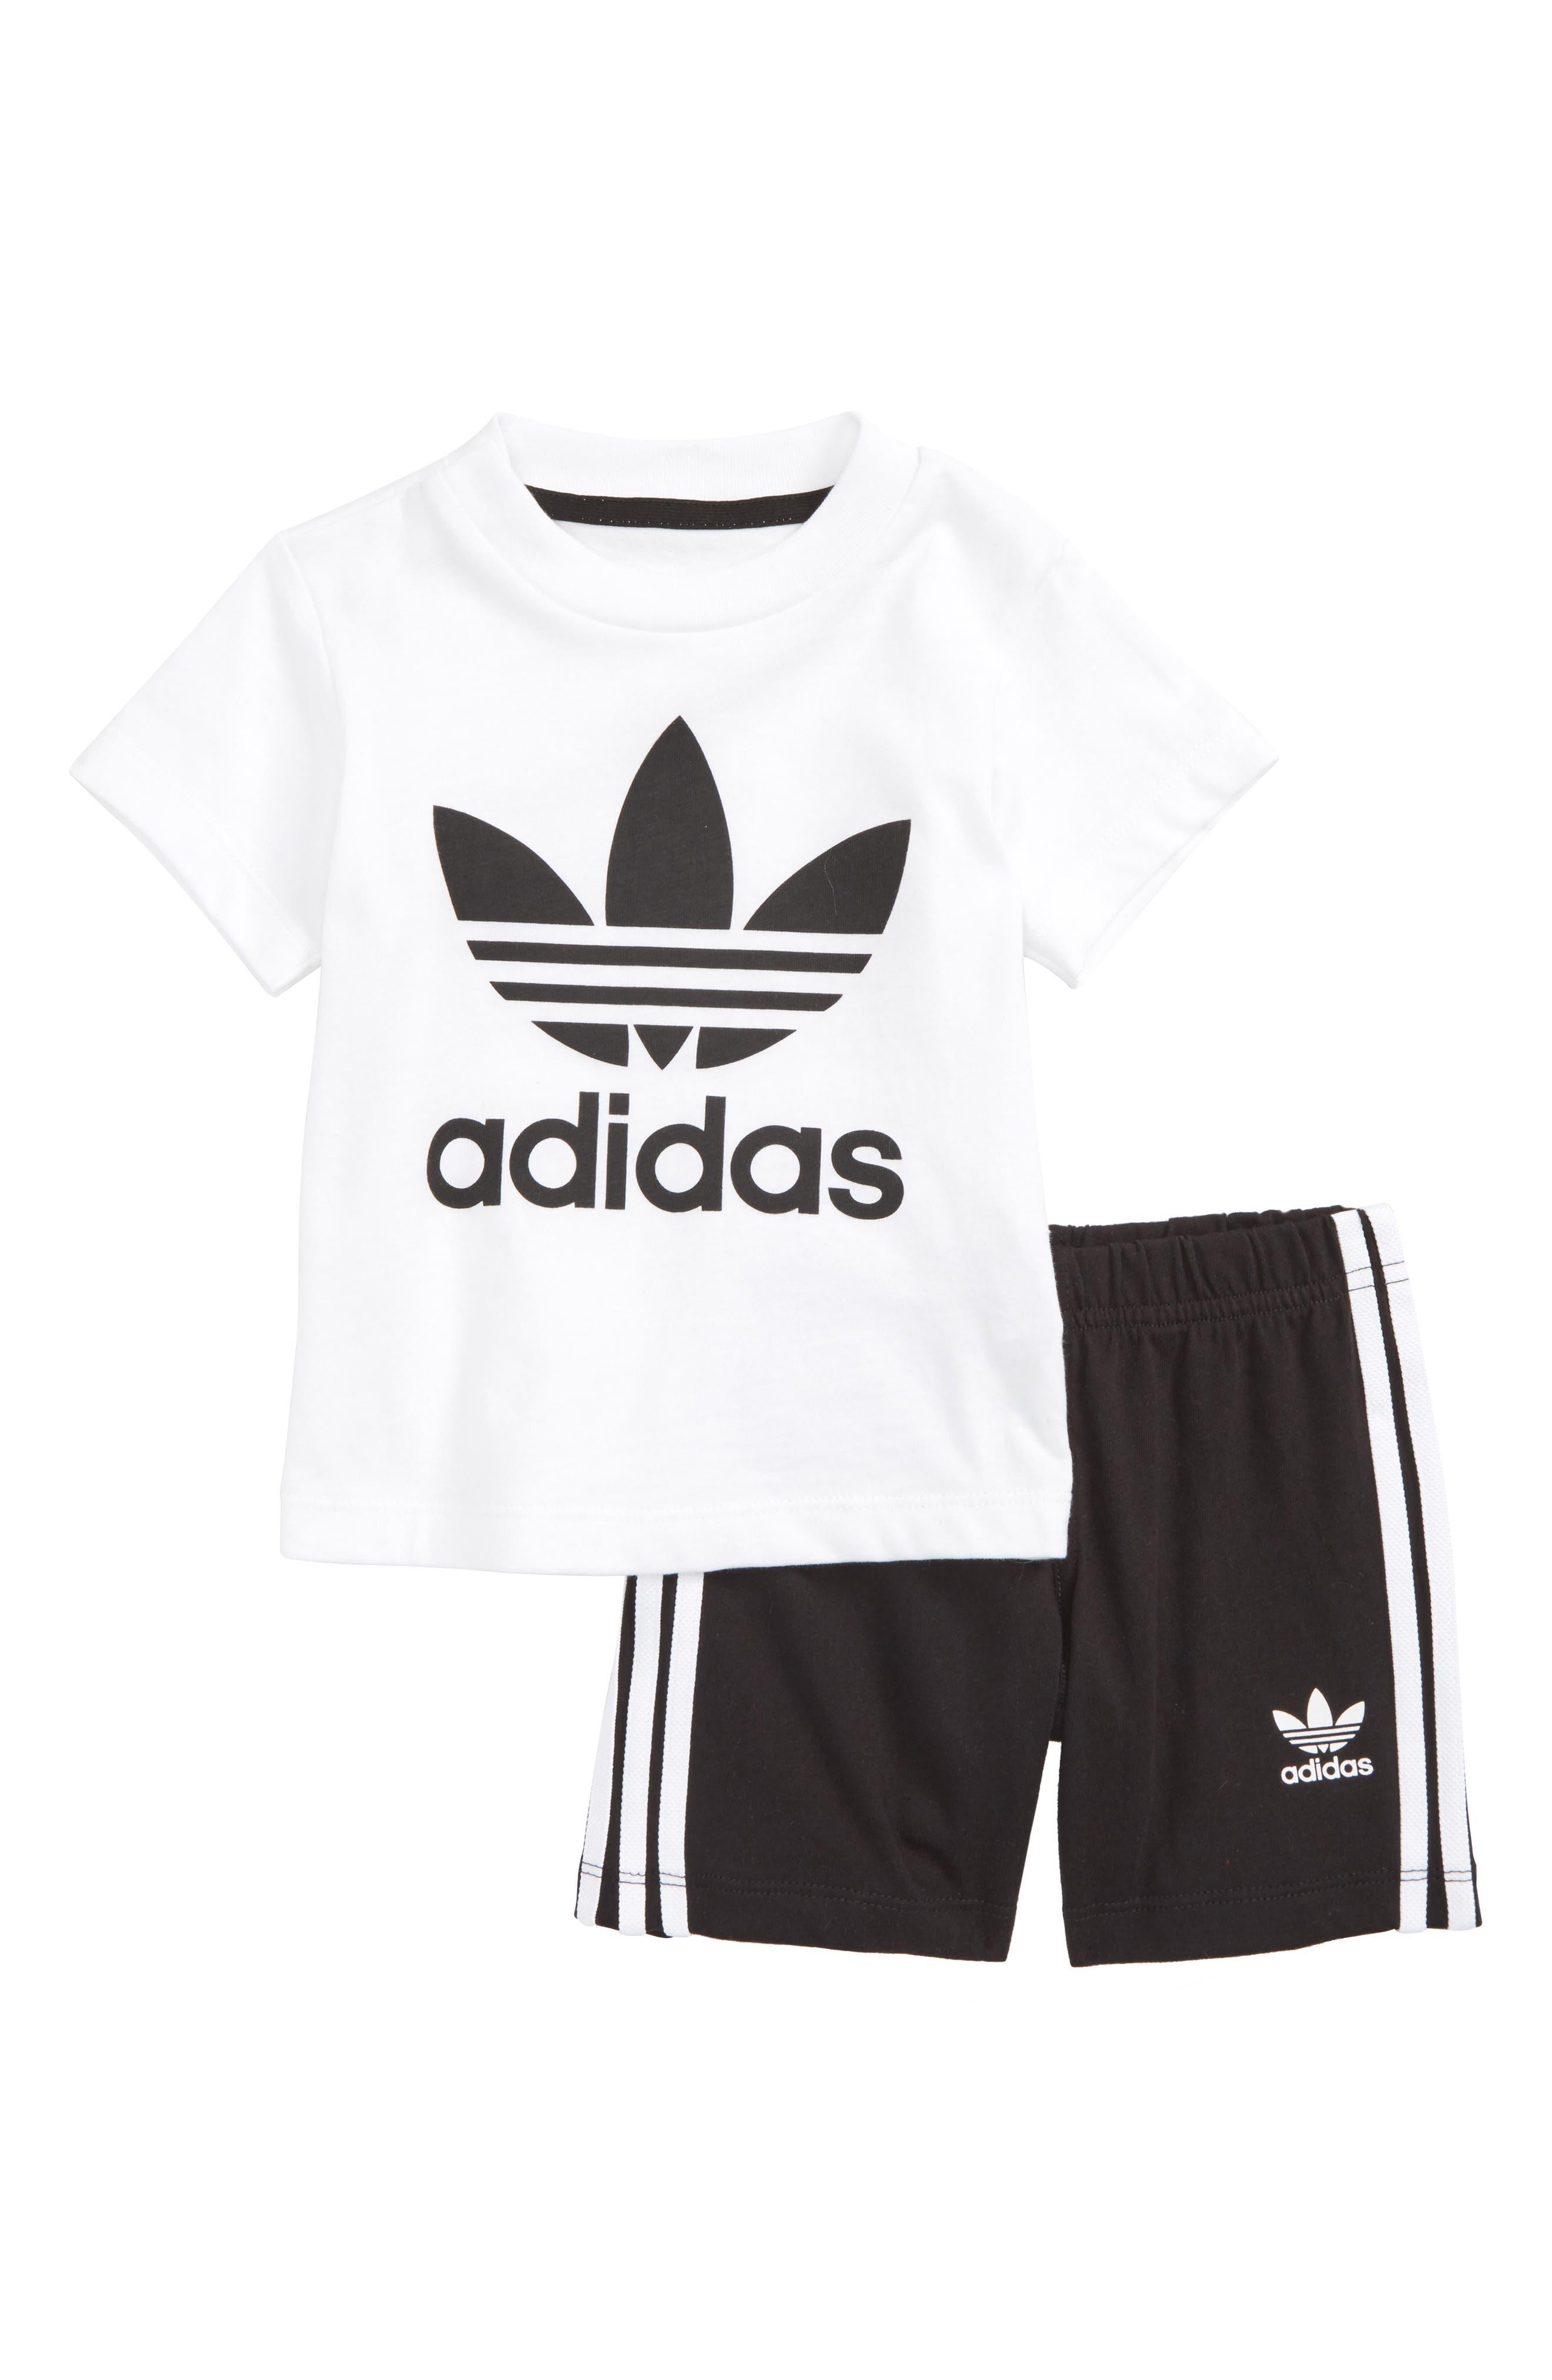 adidas Originals Graphic T-Shirt & Shorts Set (Baby Boys)